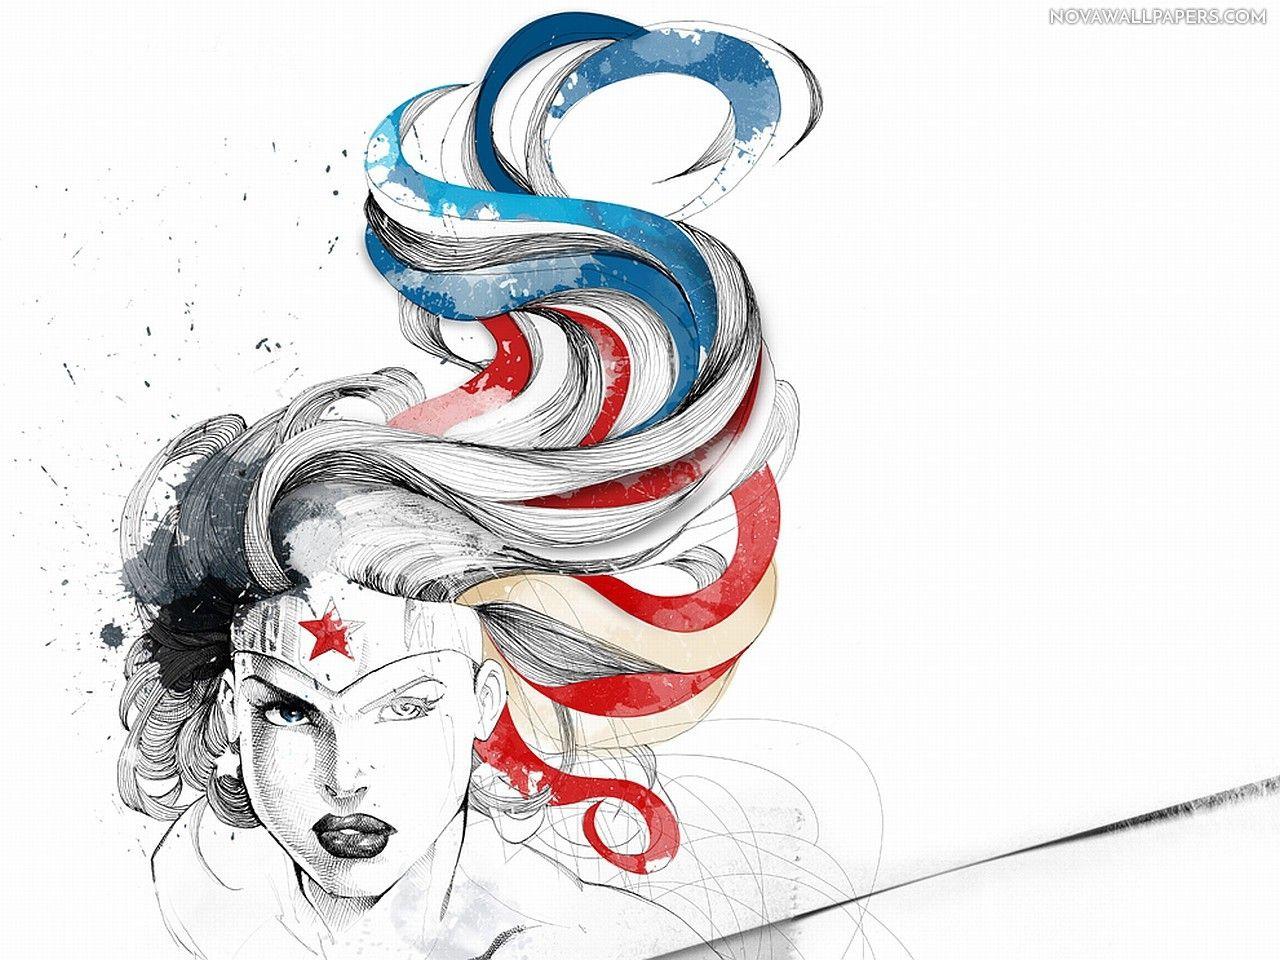 Wonder Woman Batman V Superman Sketch Art Hd Wallpaper Download